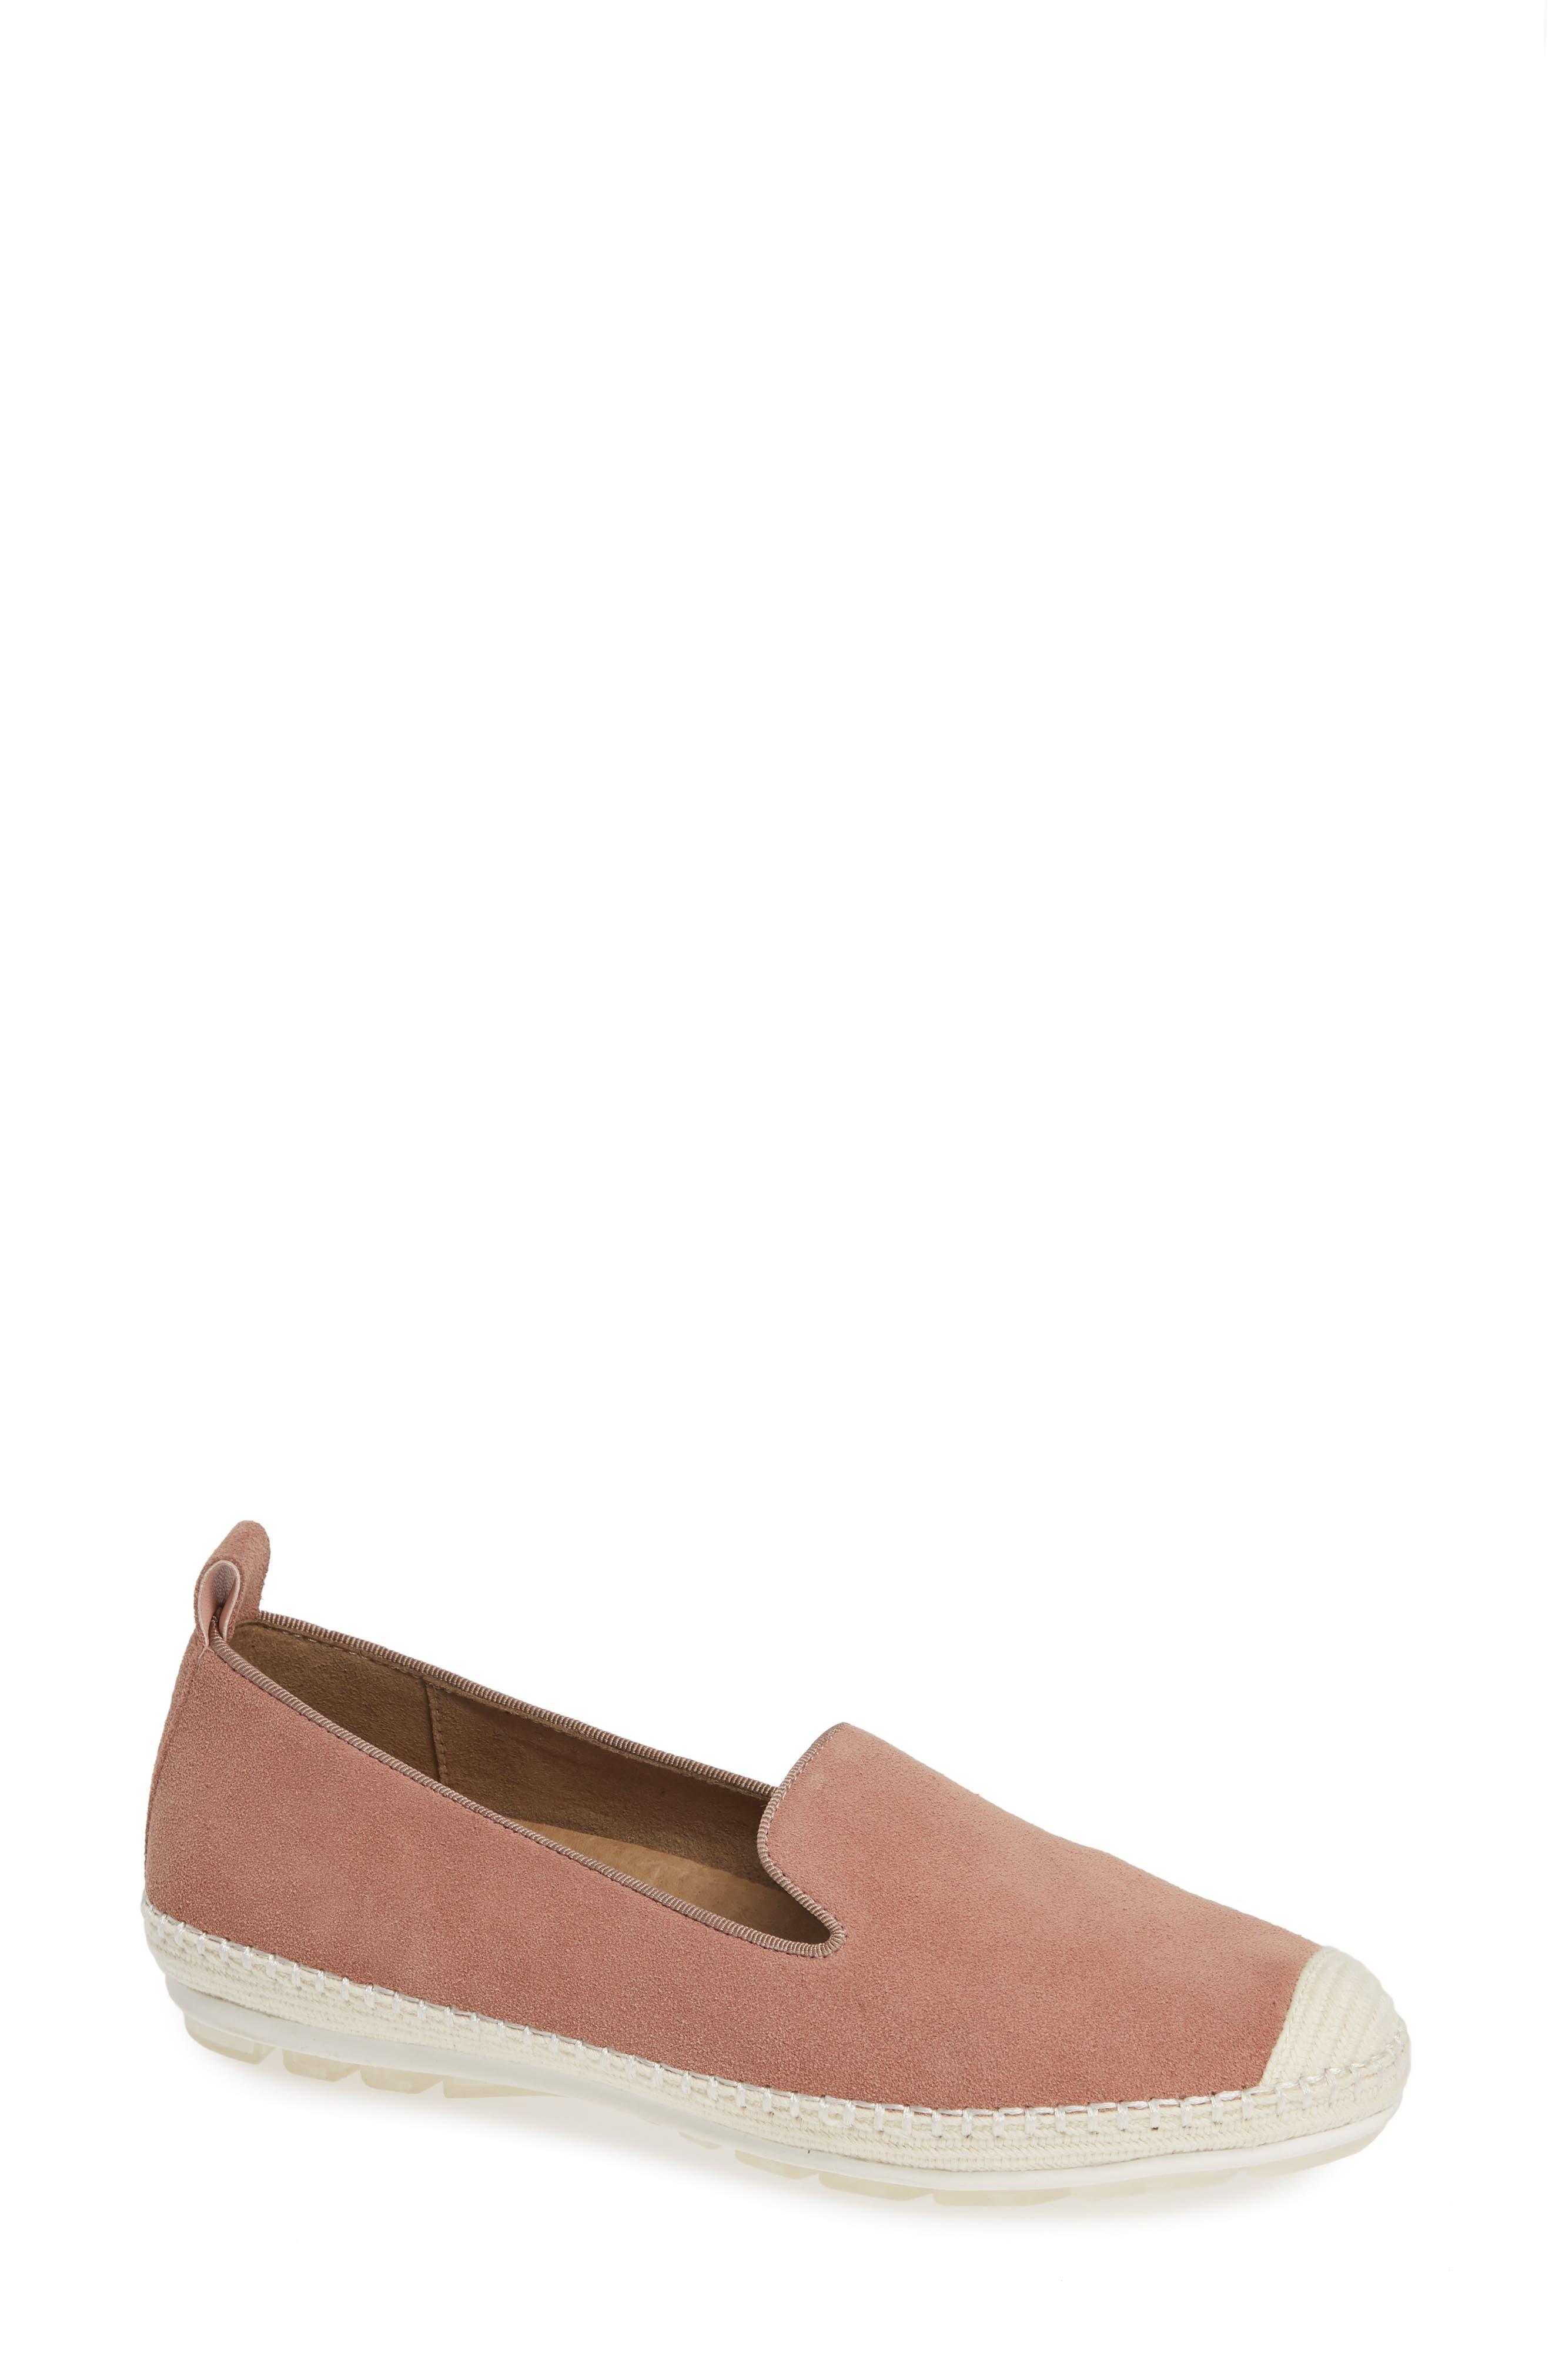 Blondo Bella Waterproof Espadrille Flat- Pink